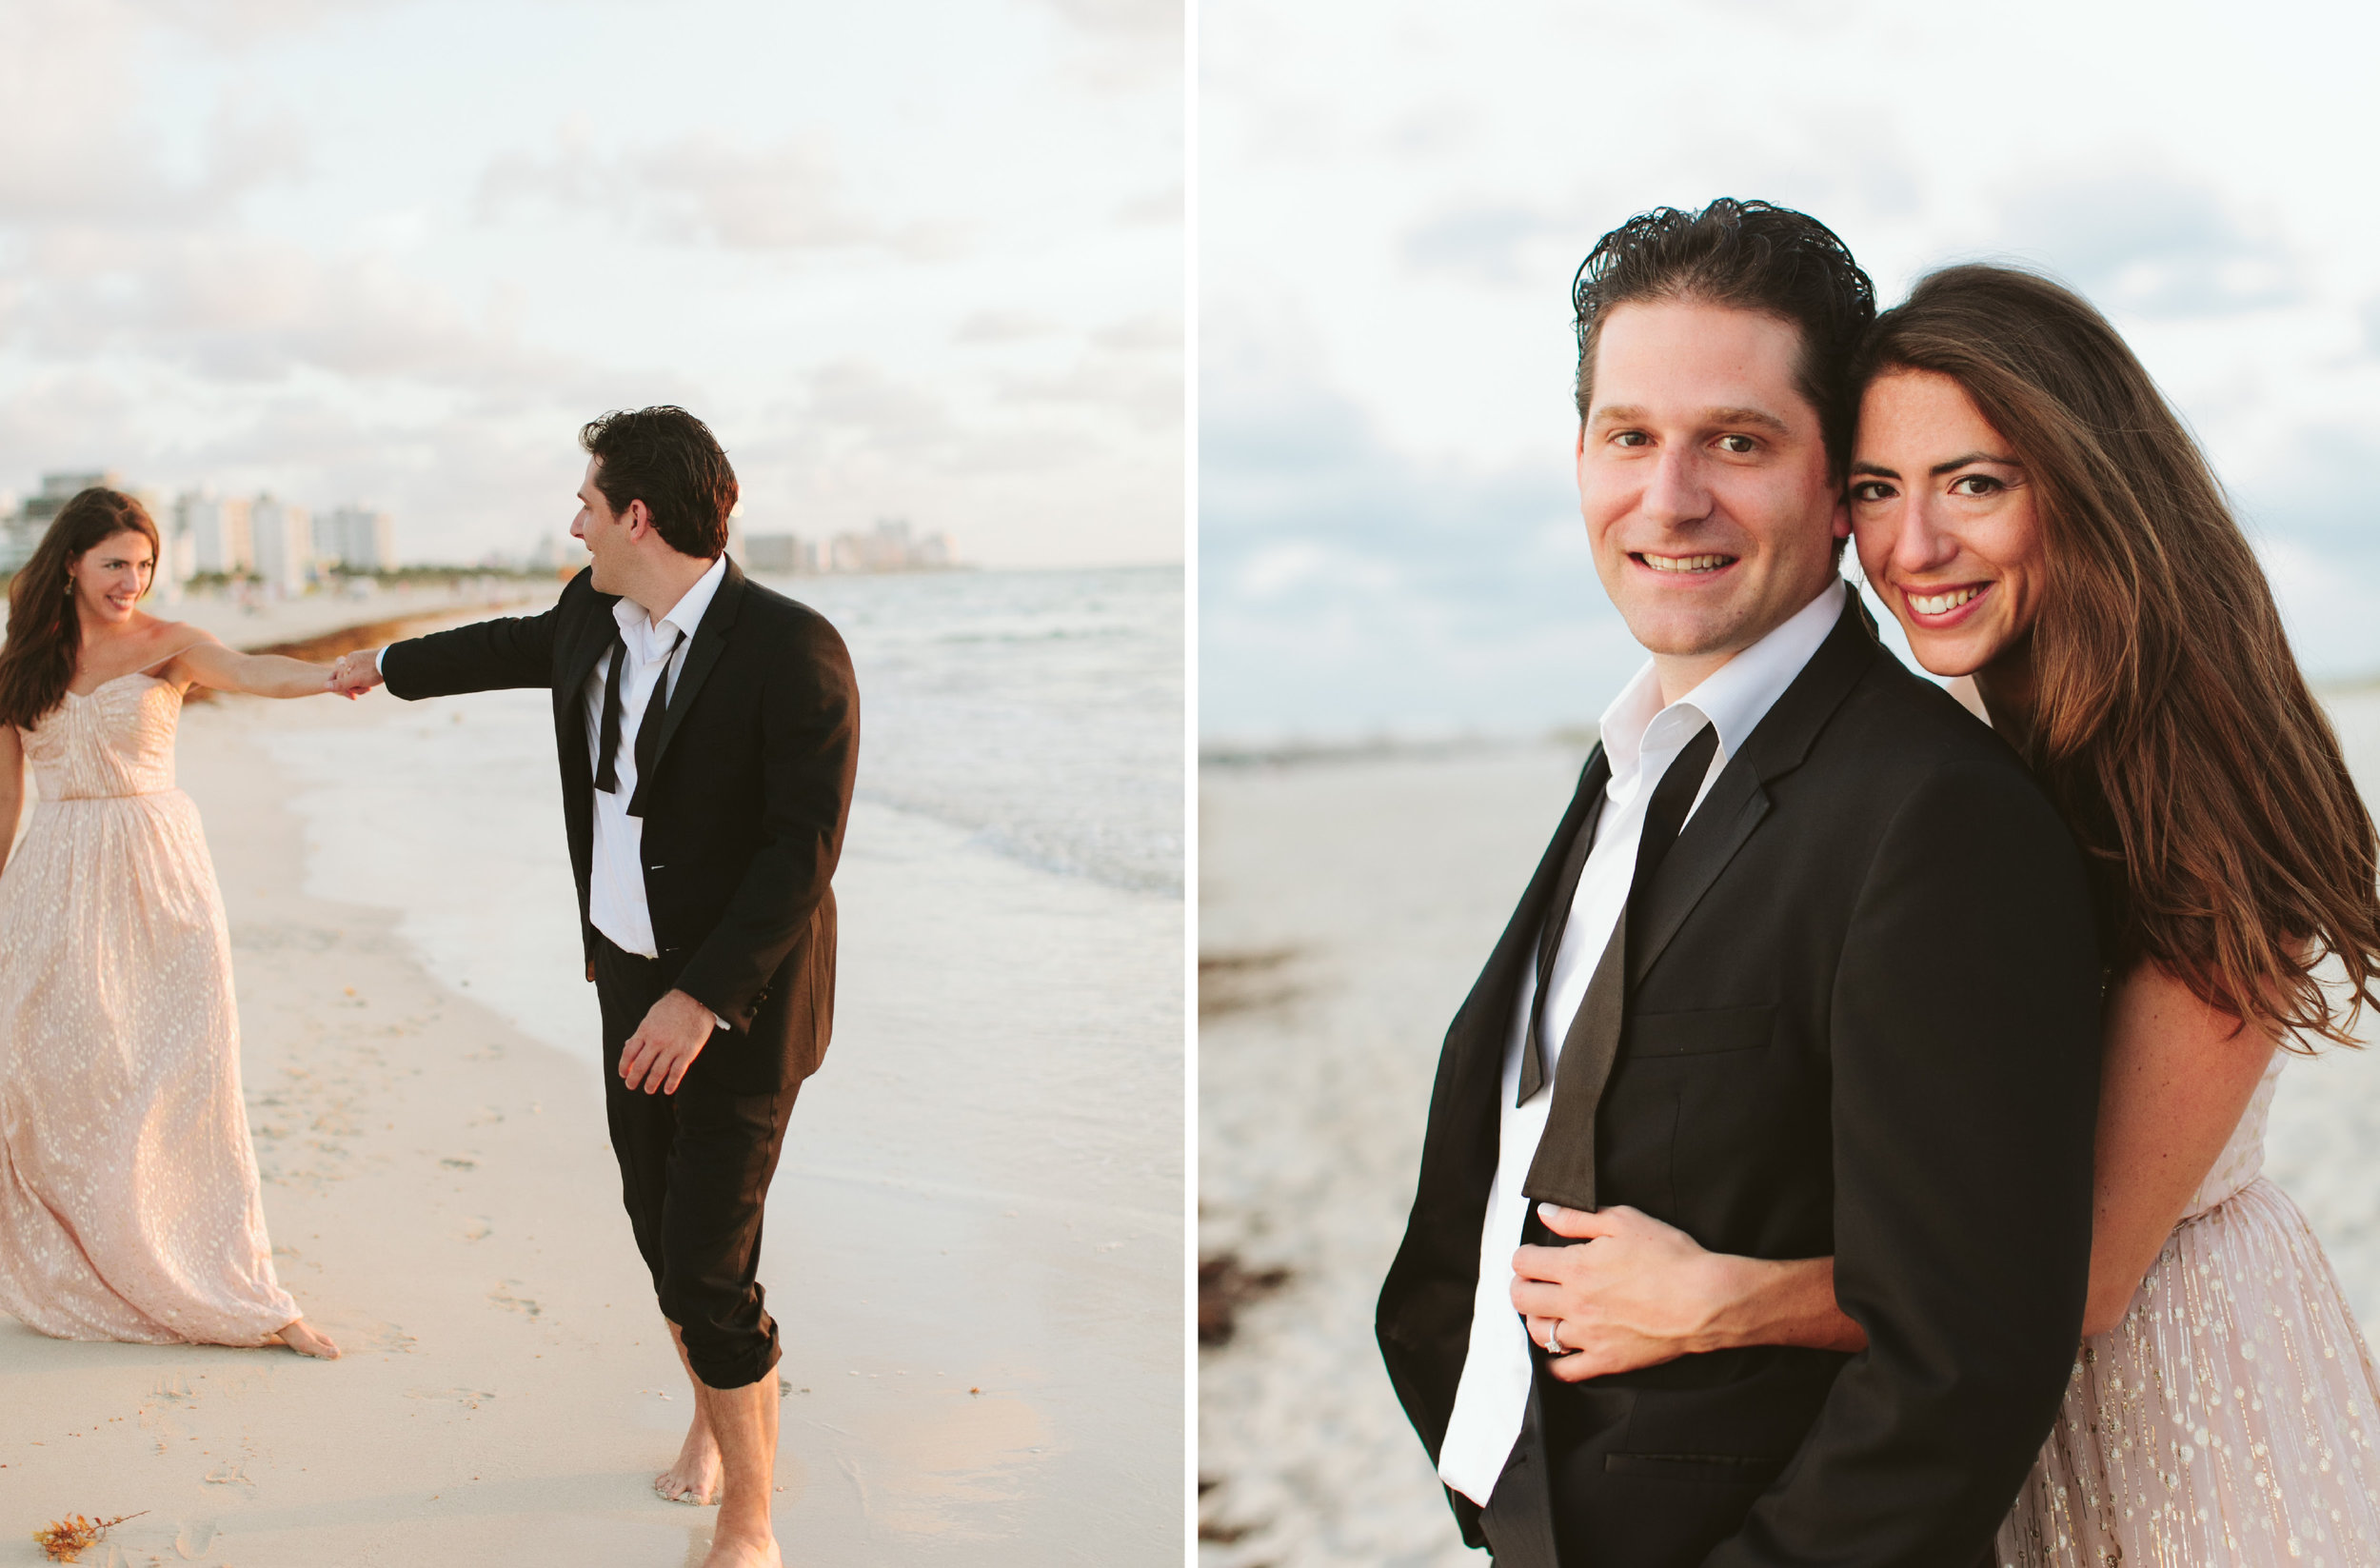 Meli + Mike South Pointe Park South Beach Miami Engagement Shoot17.jpg